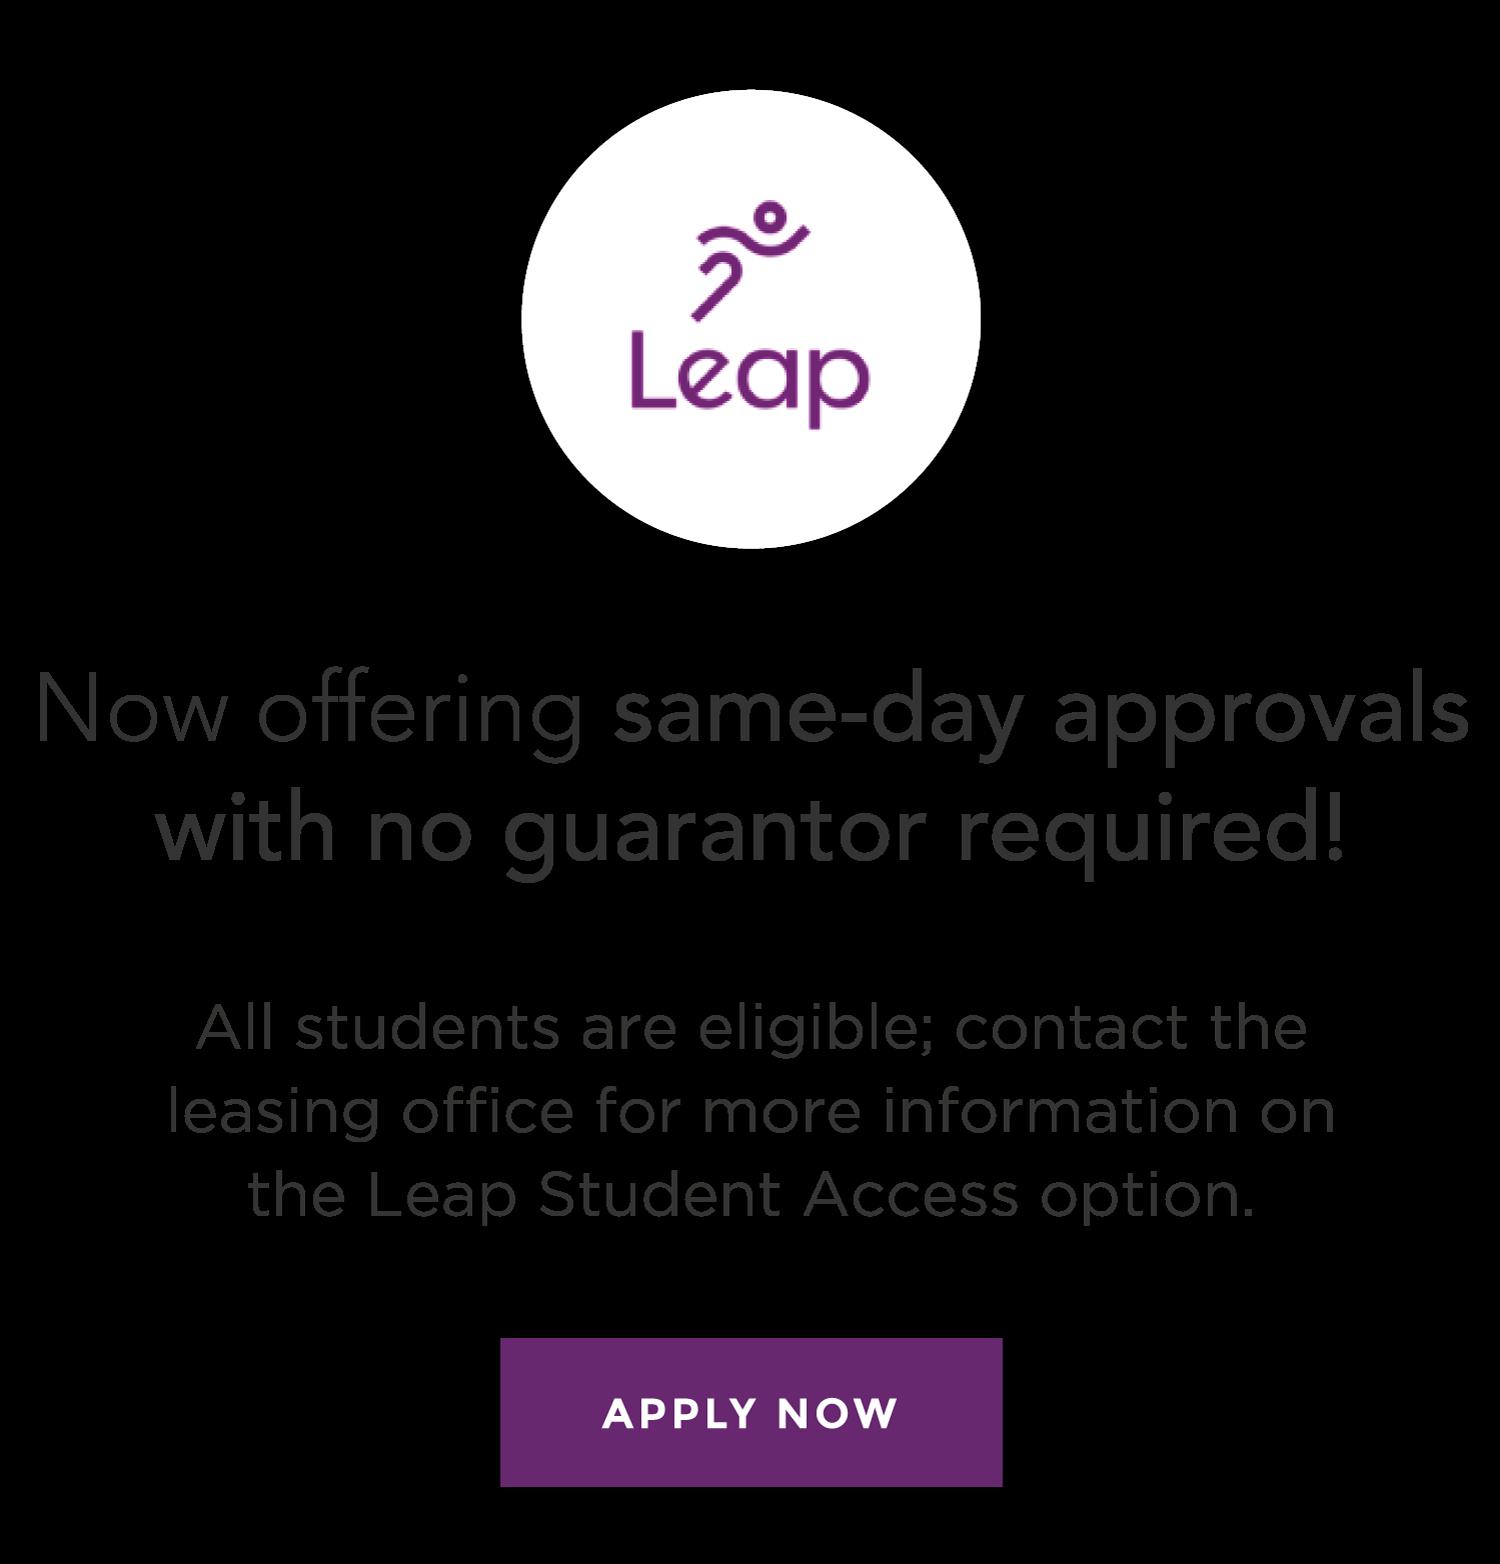 Leap student access option